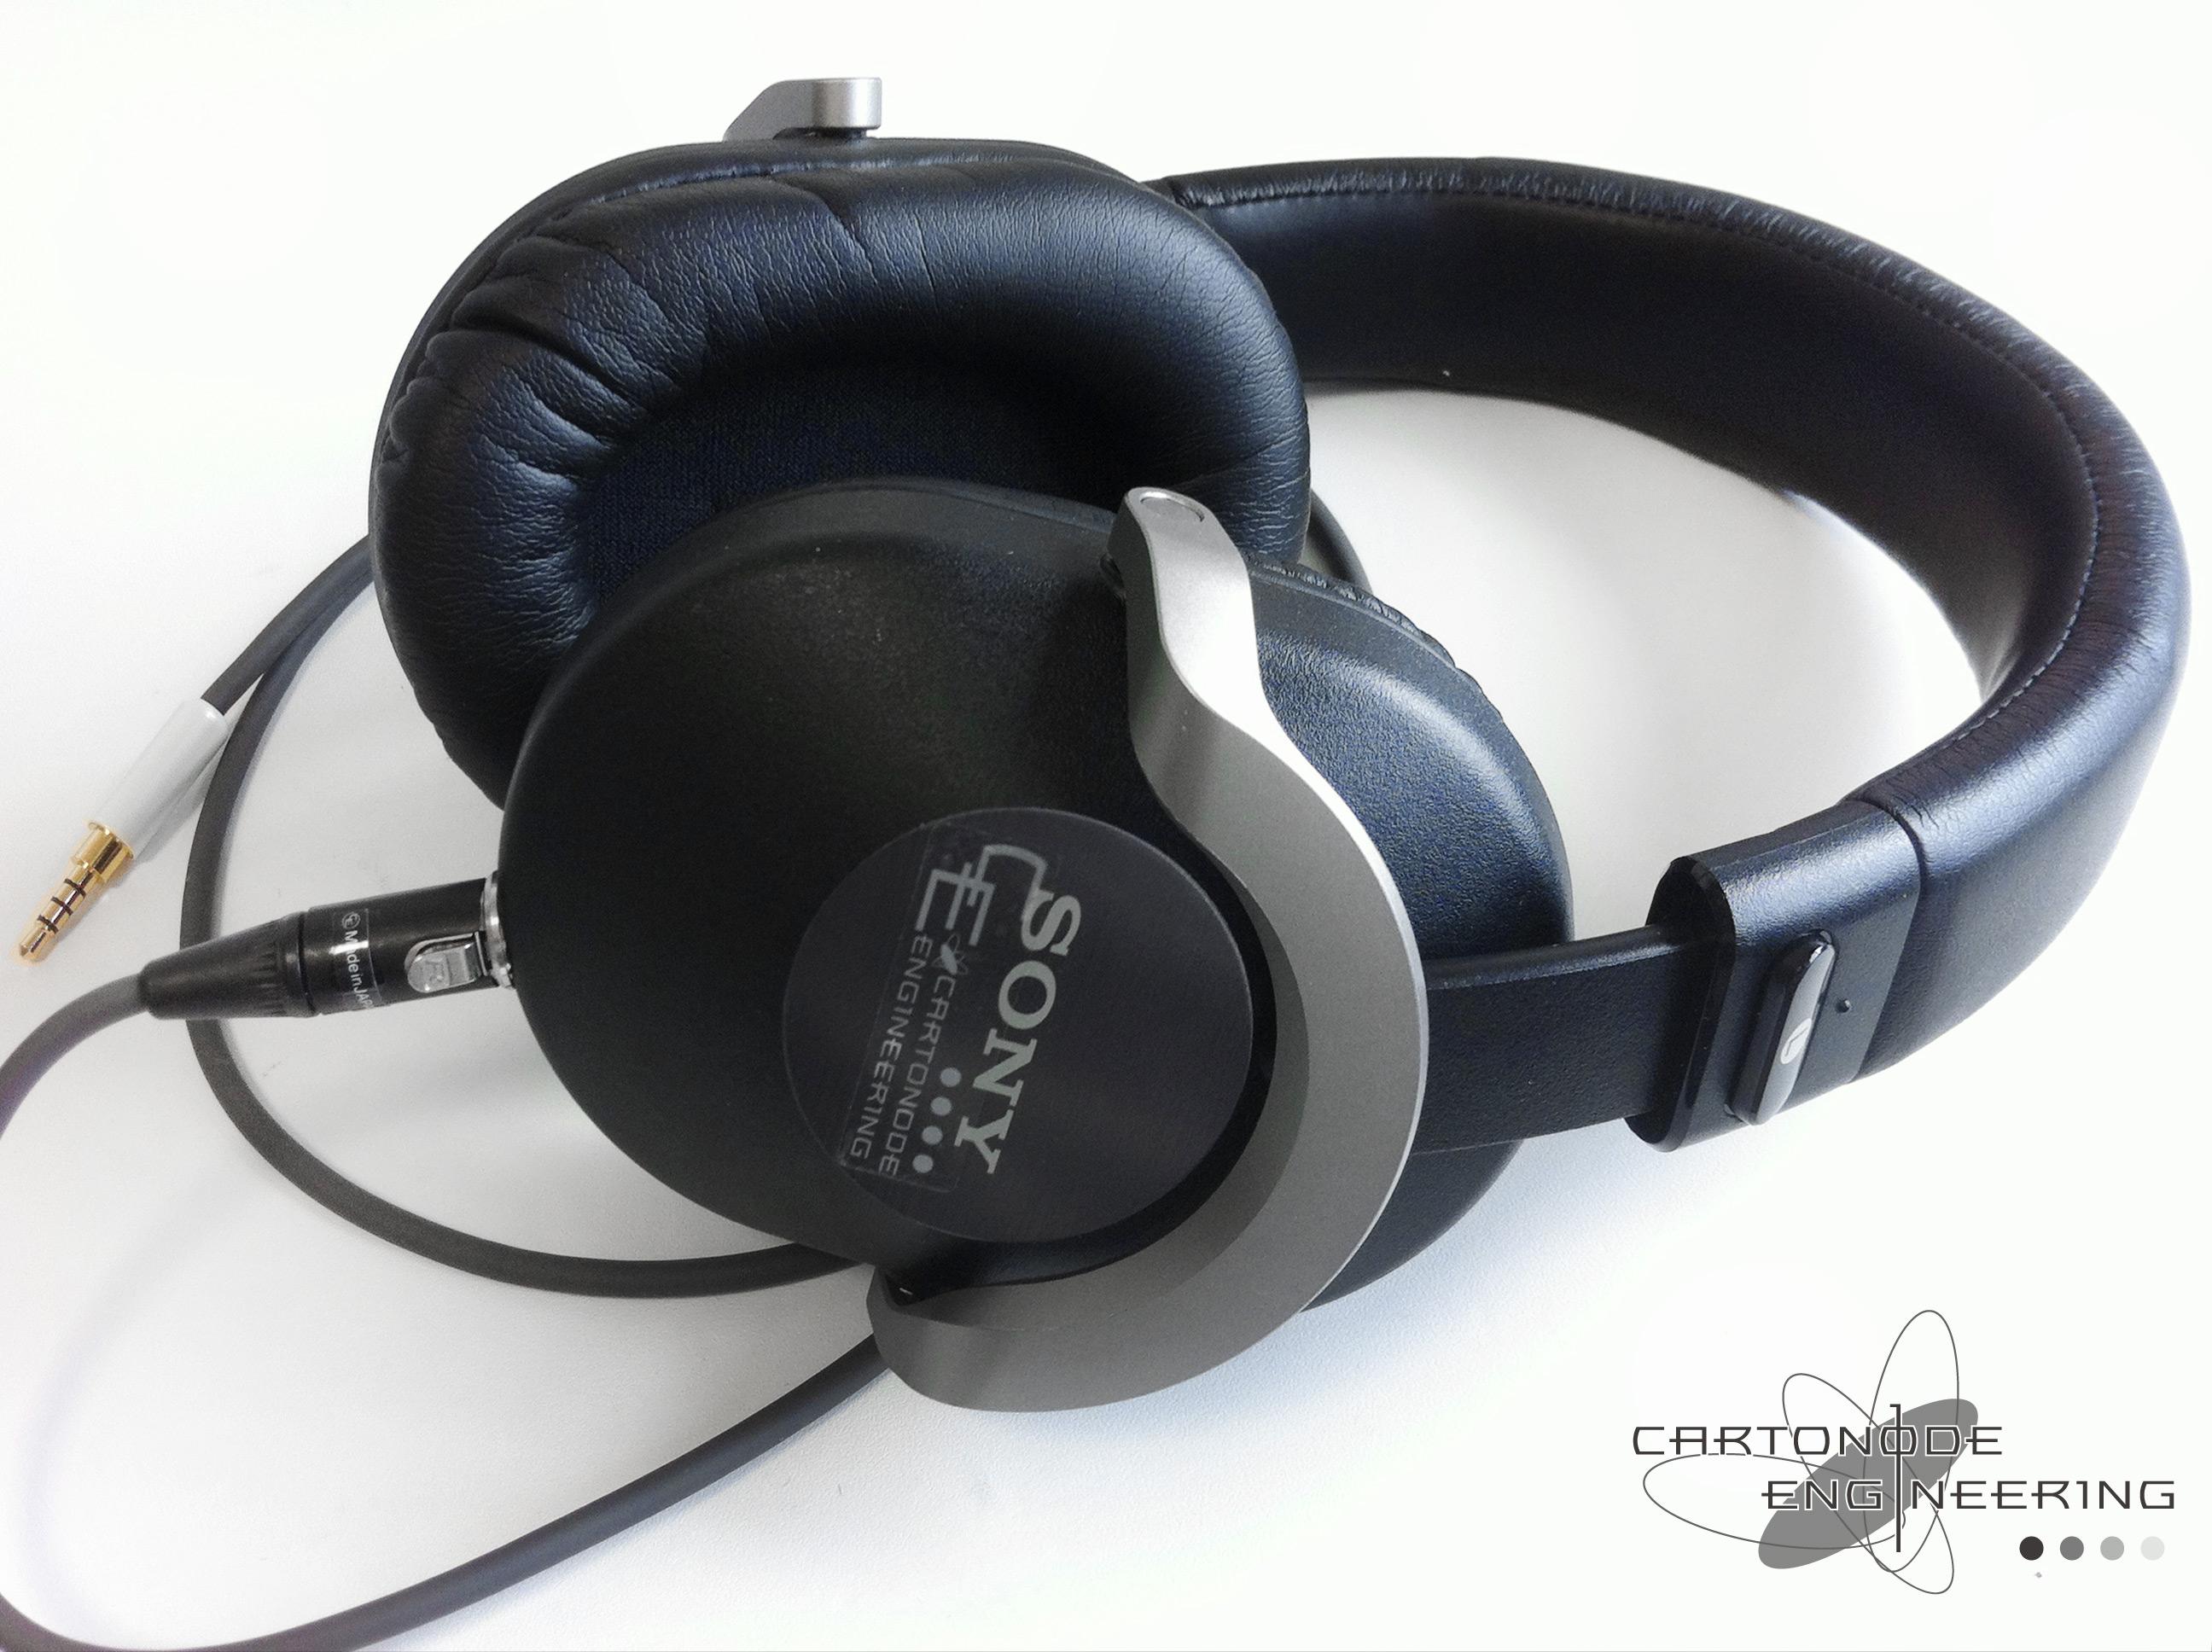 CE-MDR-ZX700mod